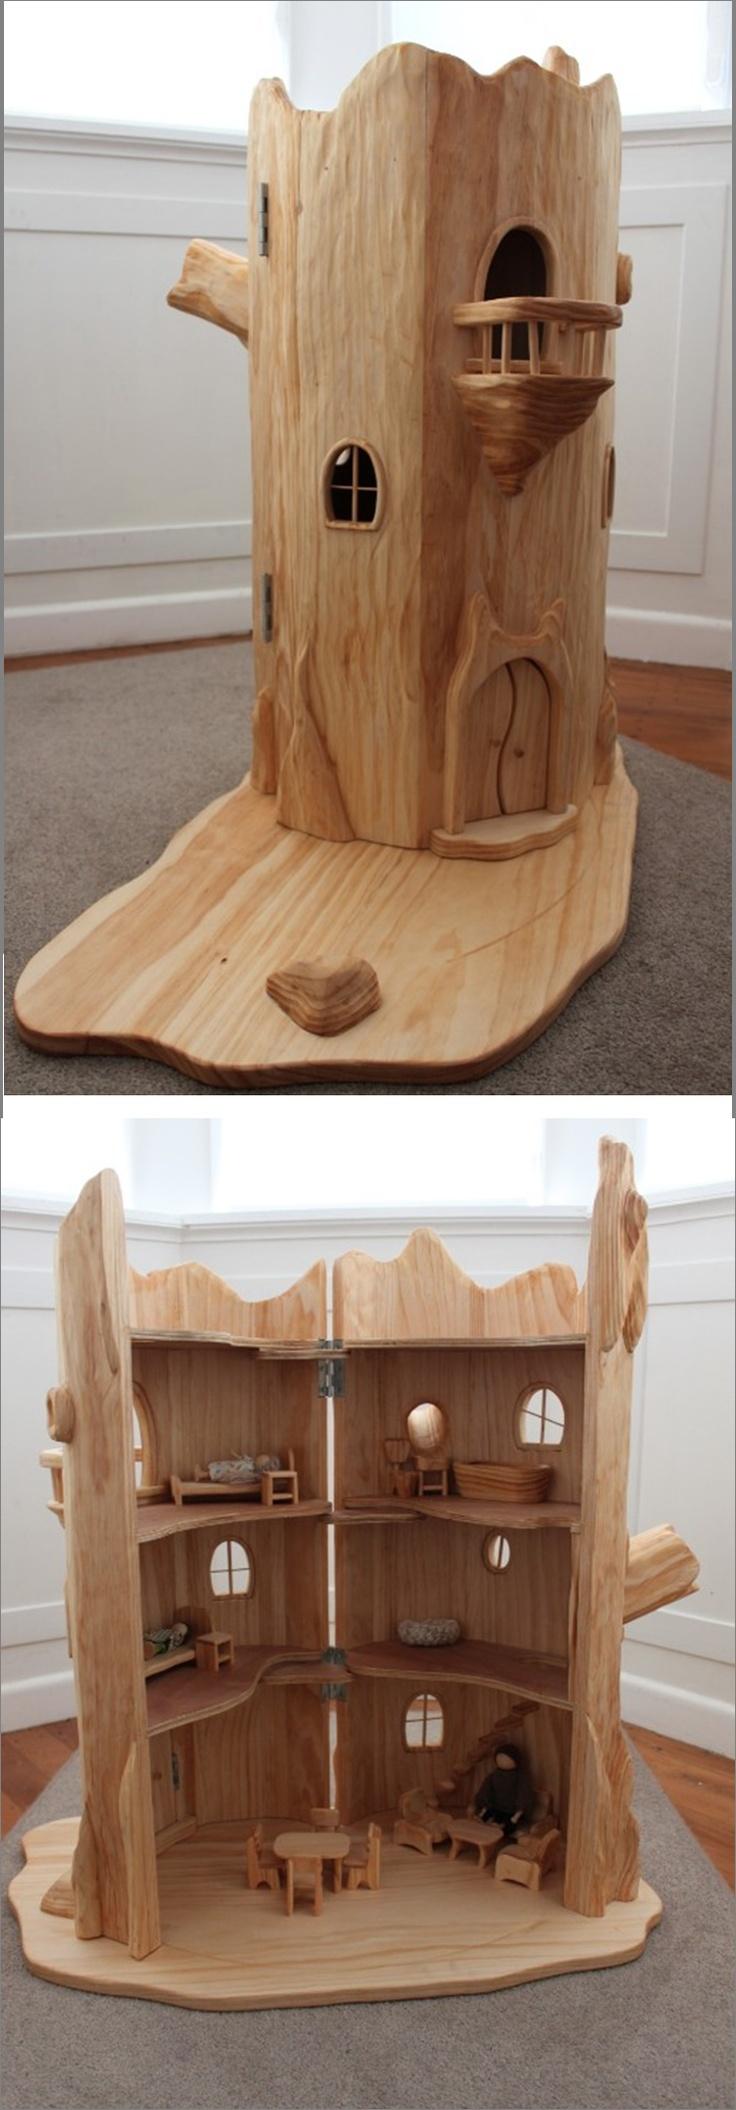 woodwork ideas 22